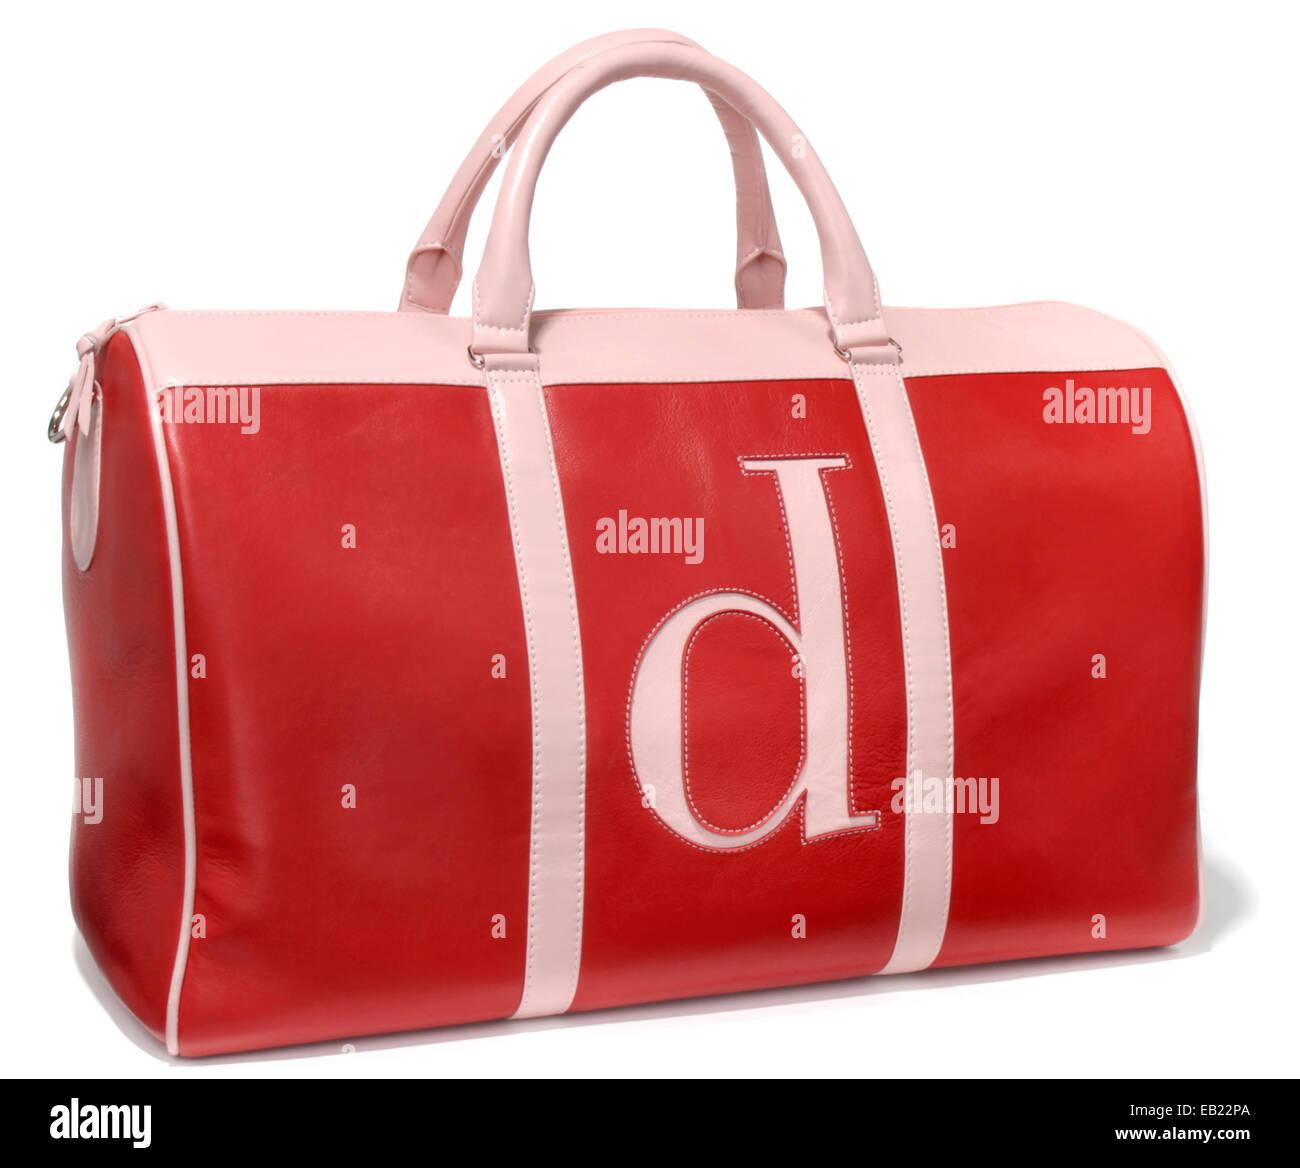 d letter bag - Stock Image